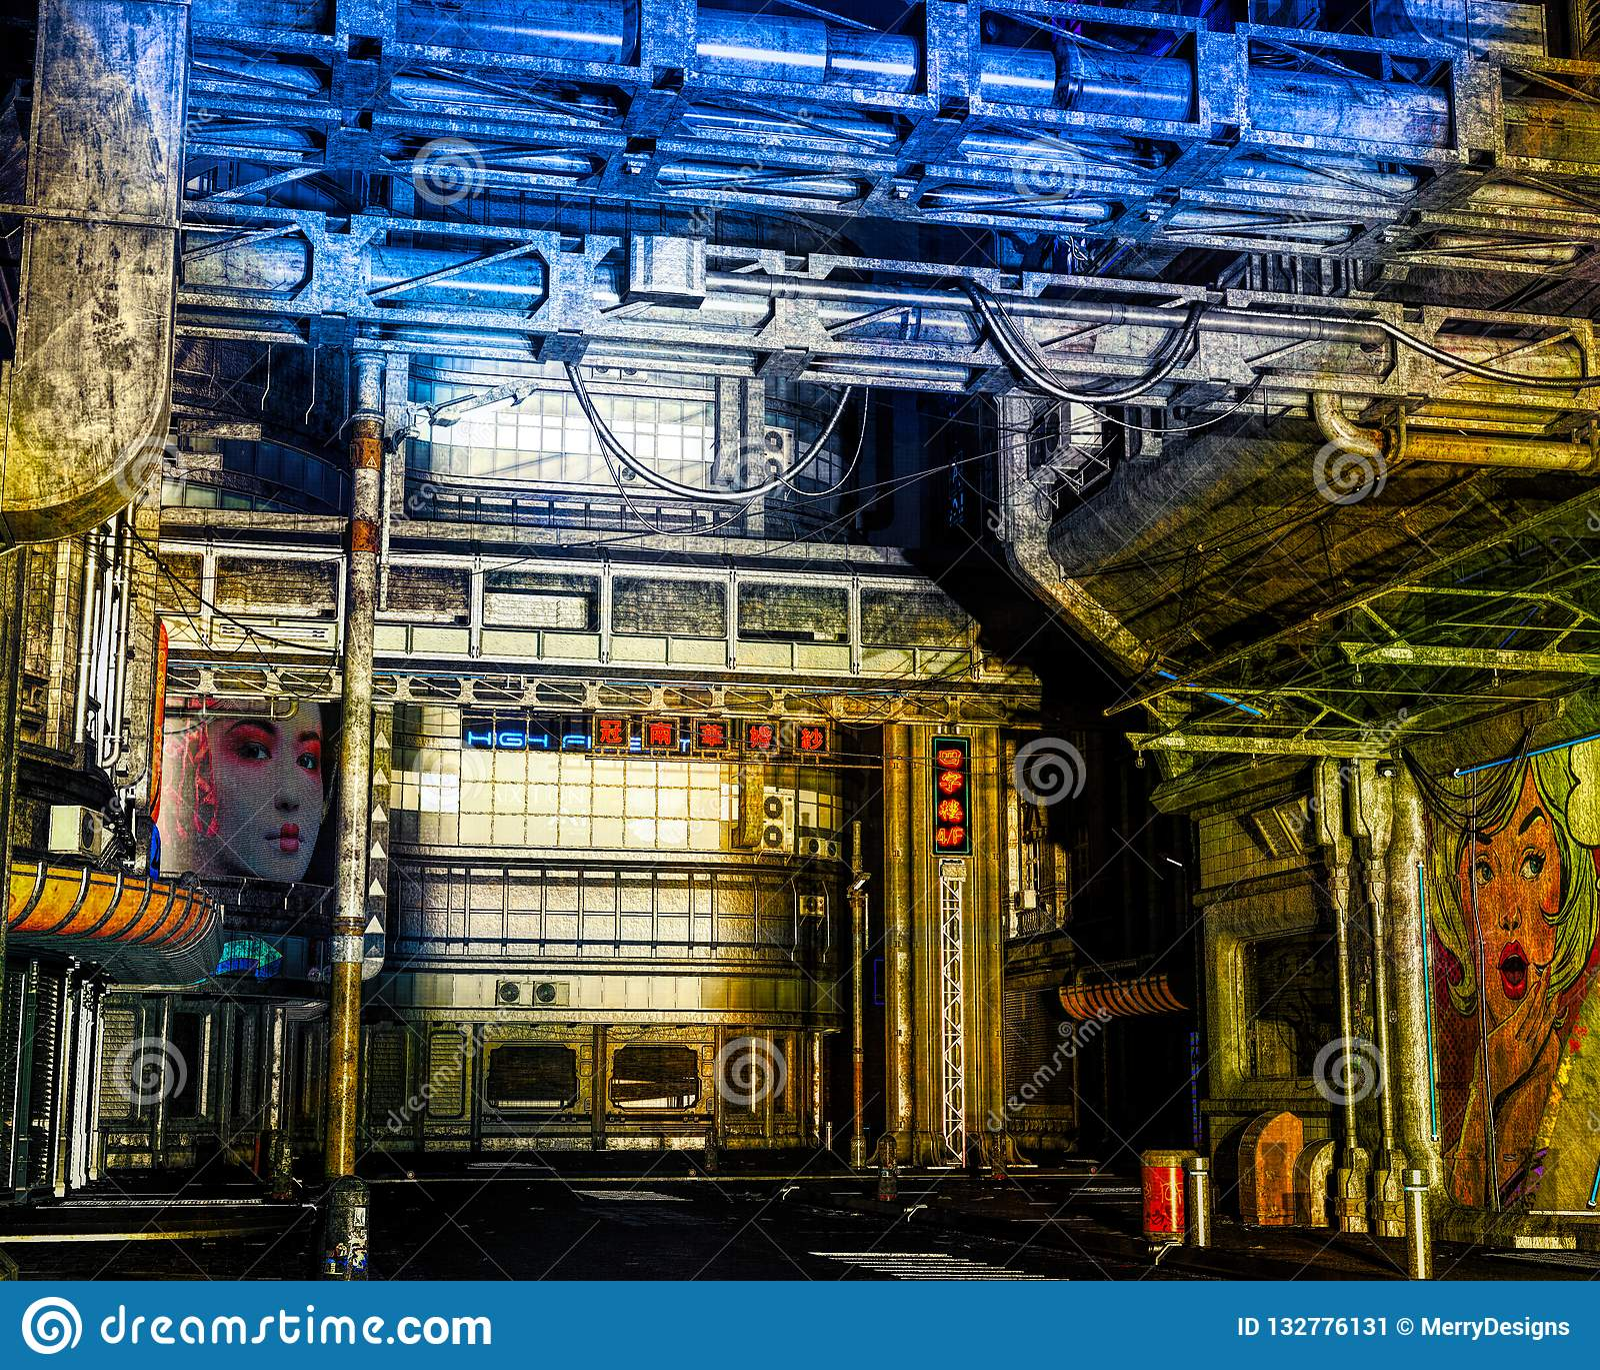 3D CG Illustration Of A Cyberpunk City Street Stock